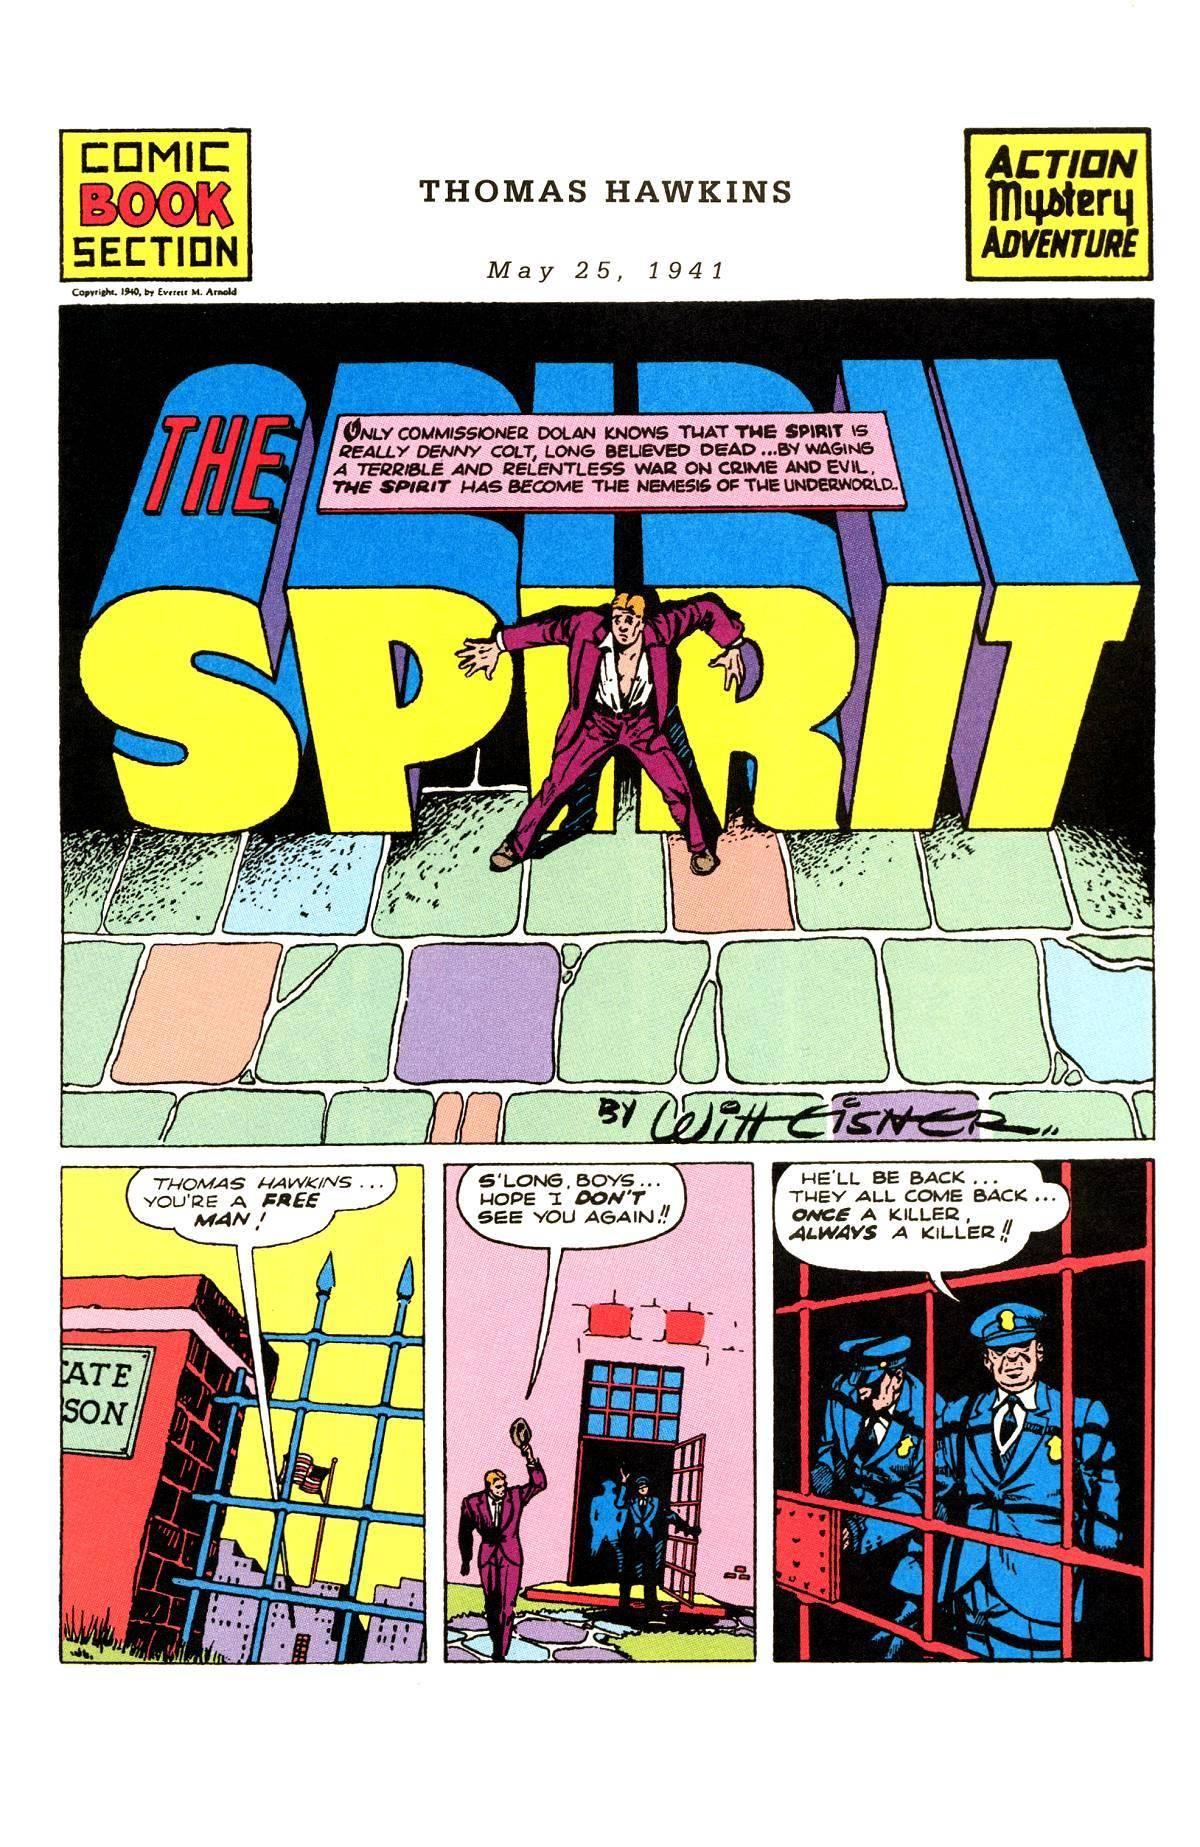 Spirit Section 052 (1941-05-25) (color)